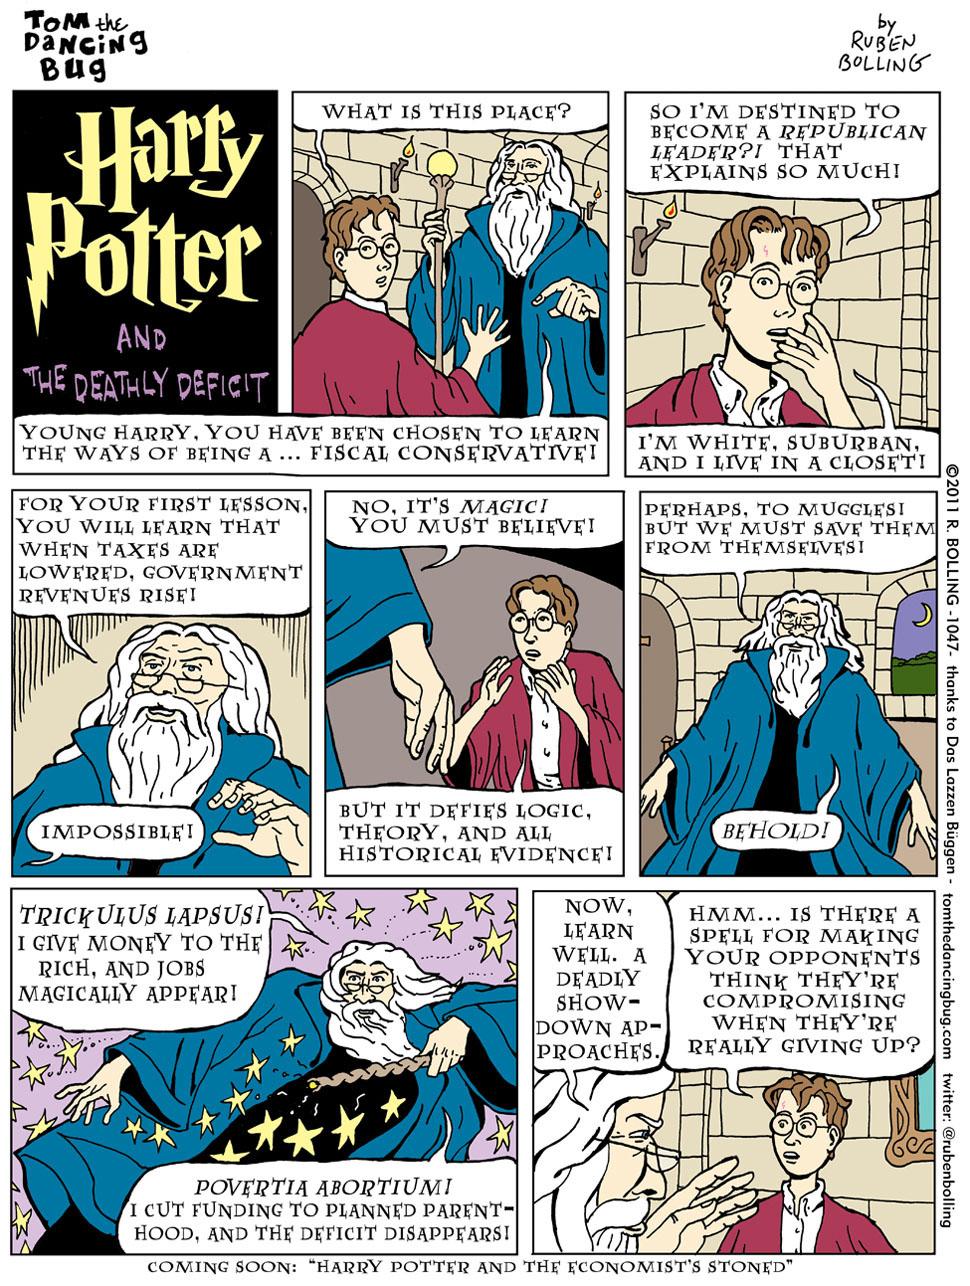 http://www.boingboing.net/ttdb/20110719/comic.jpg/1047cbCOMIC%20harry%20potter.jpg